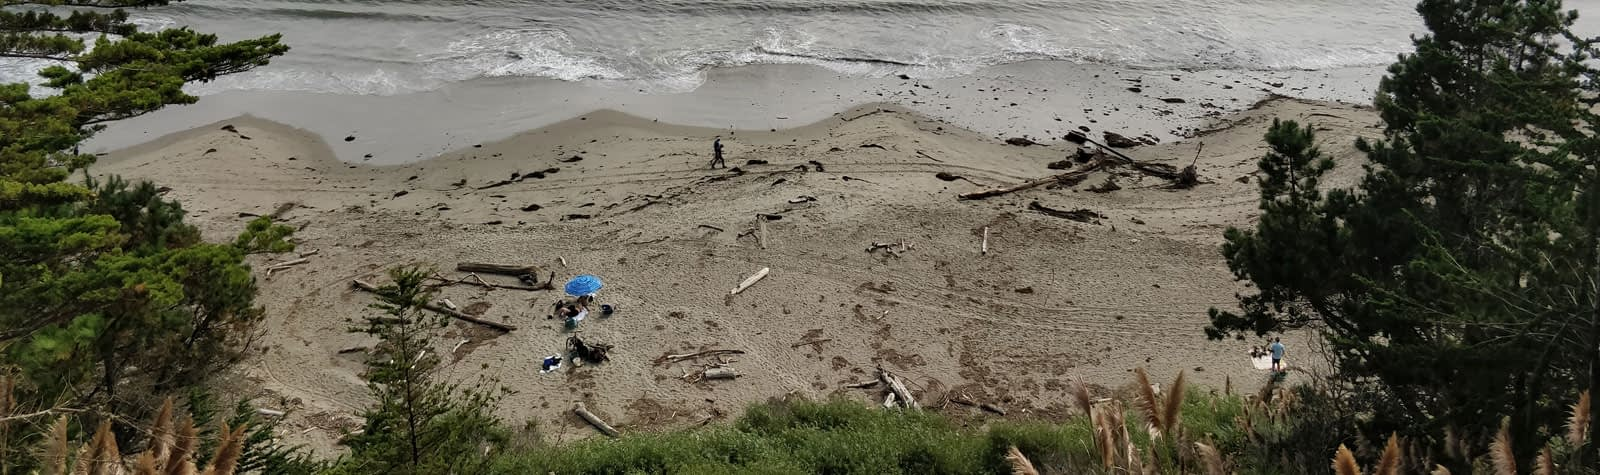 Day 36 – New Brighton State Beach to Salinas